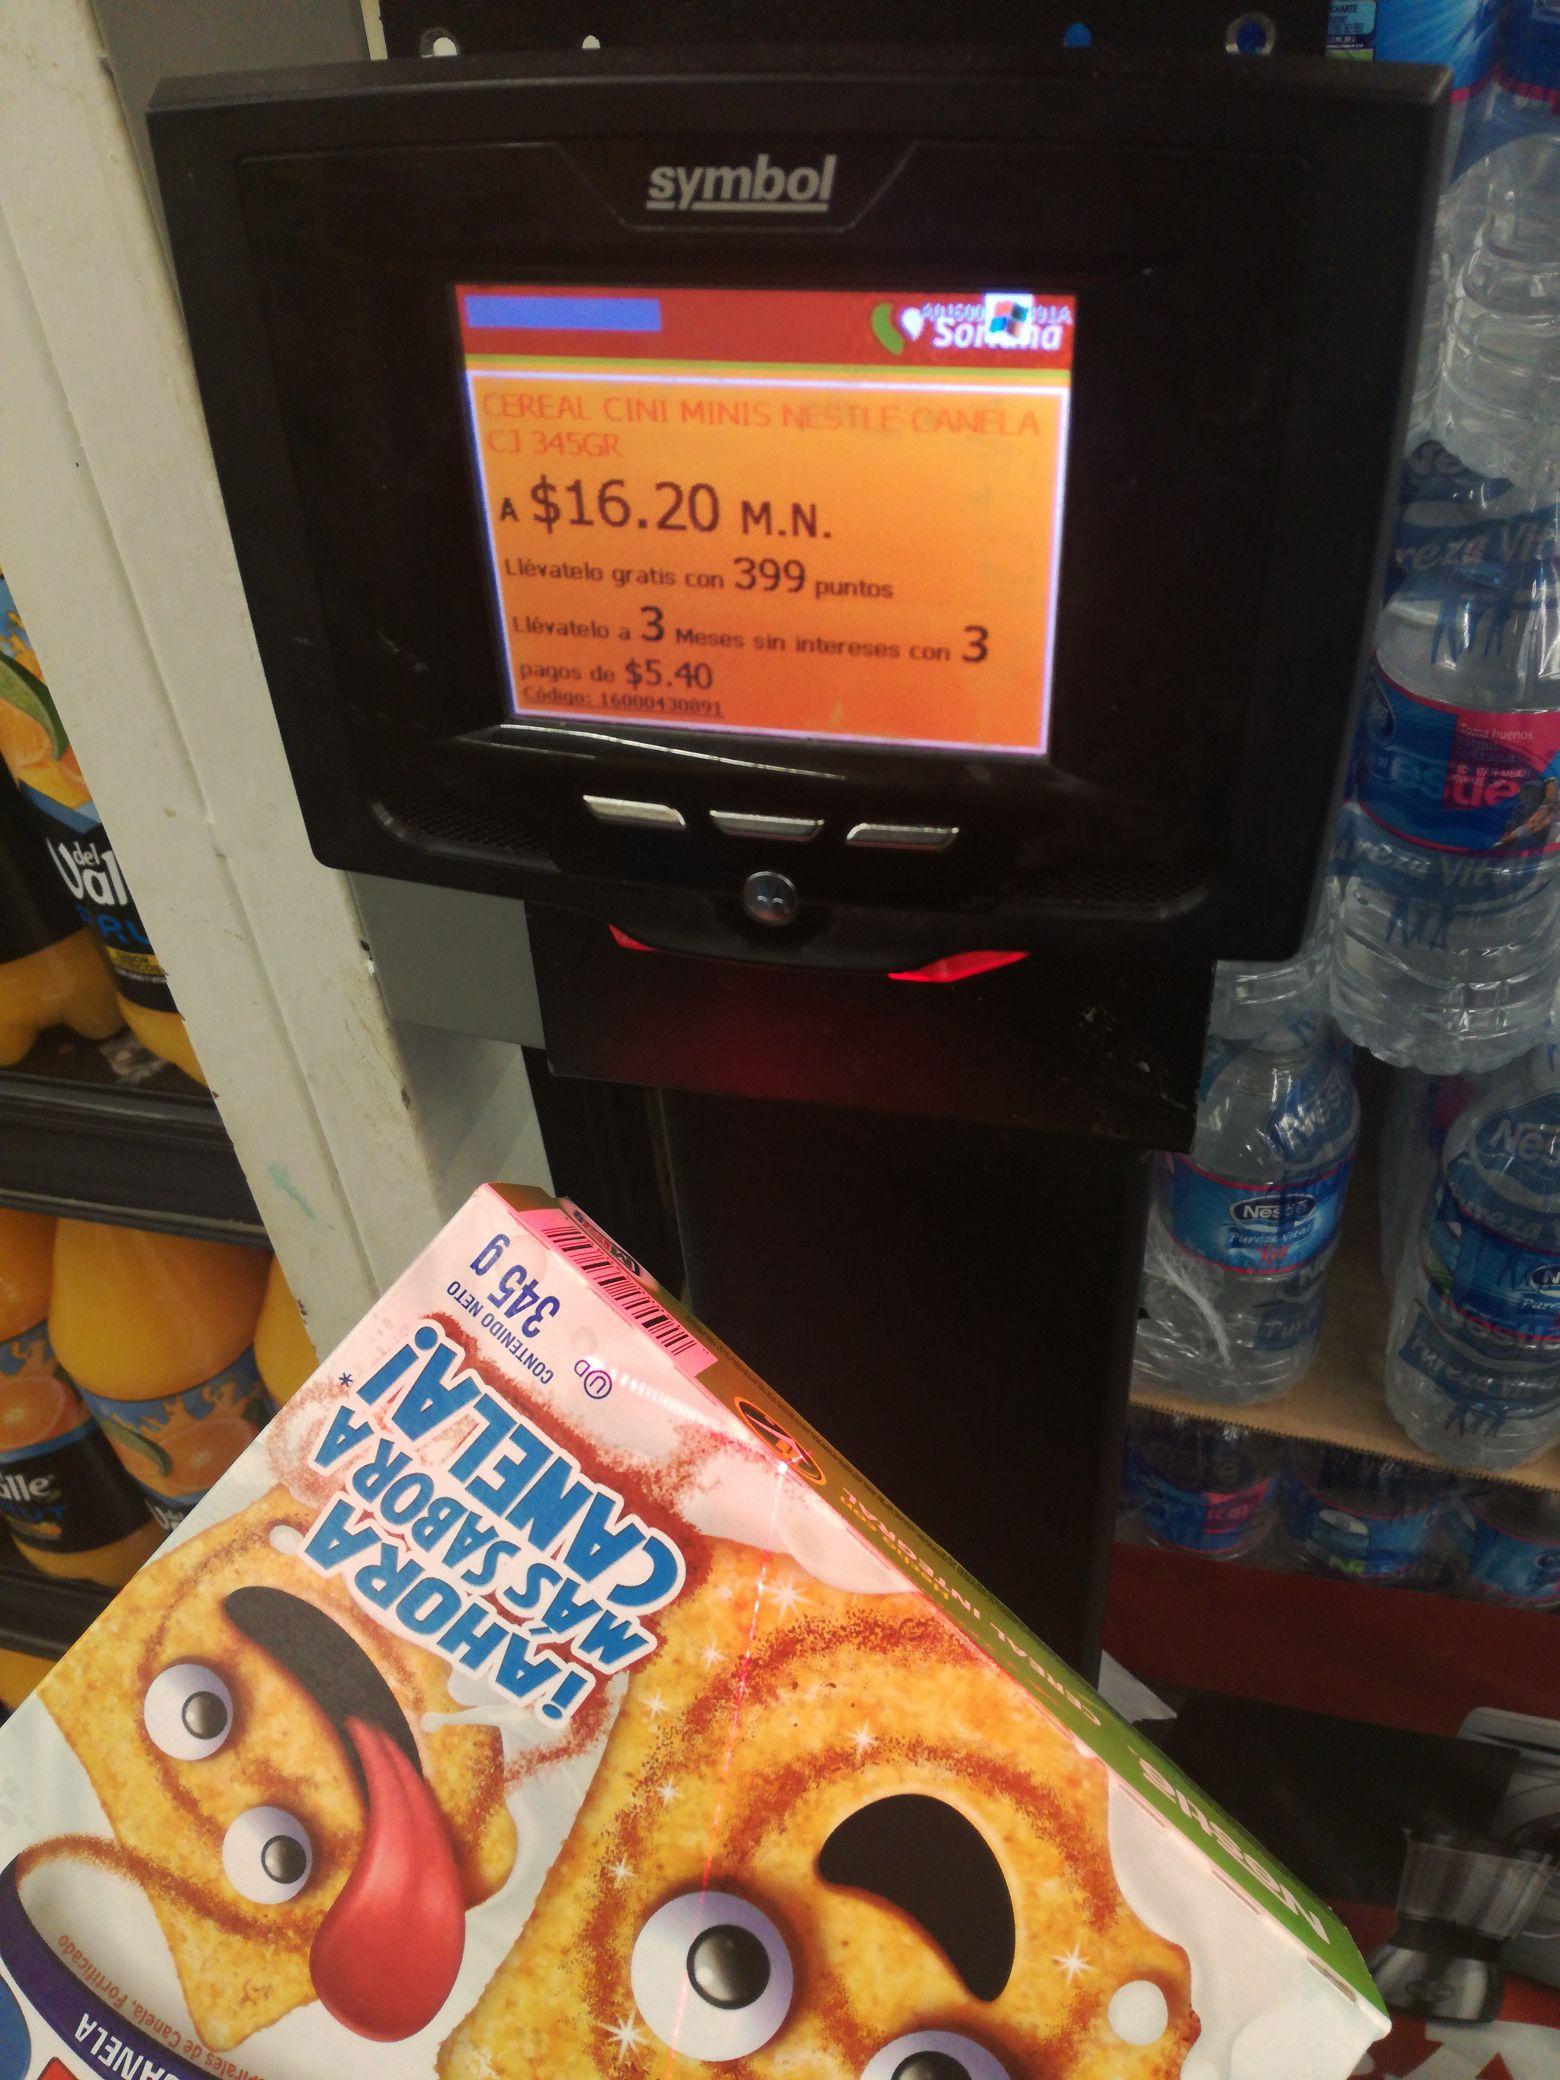 Soriana: Cereal cini minis 345gr